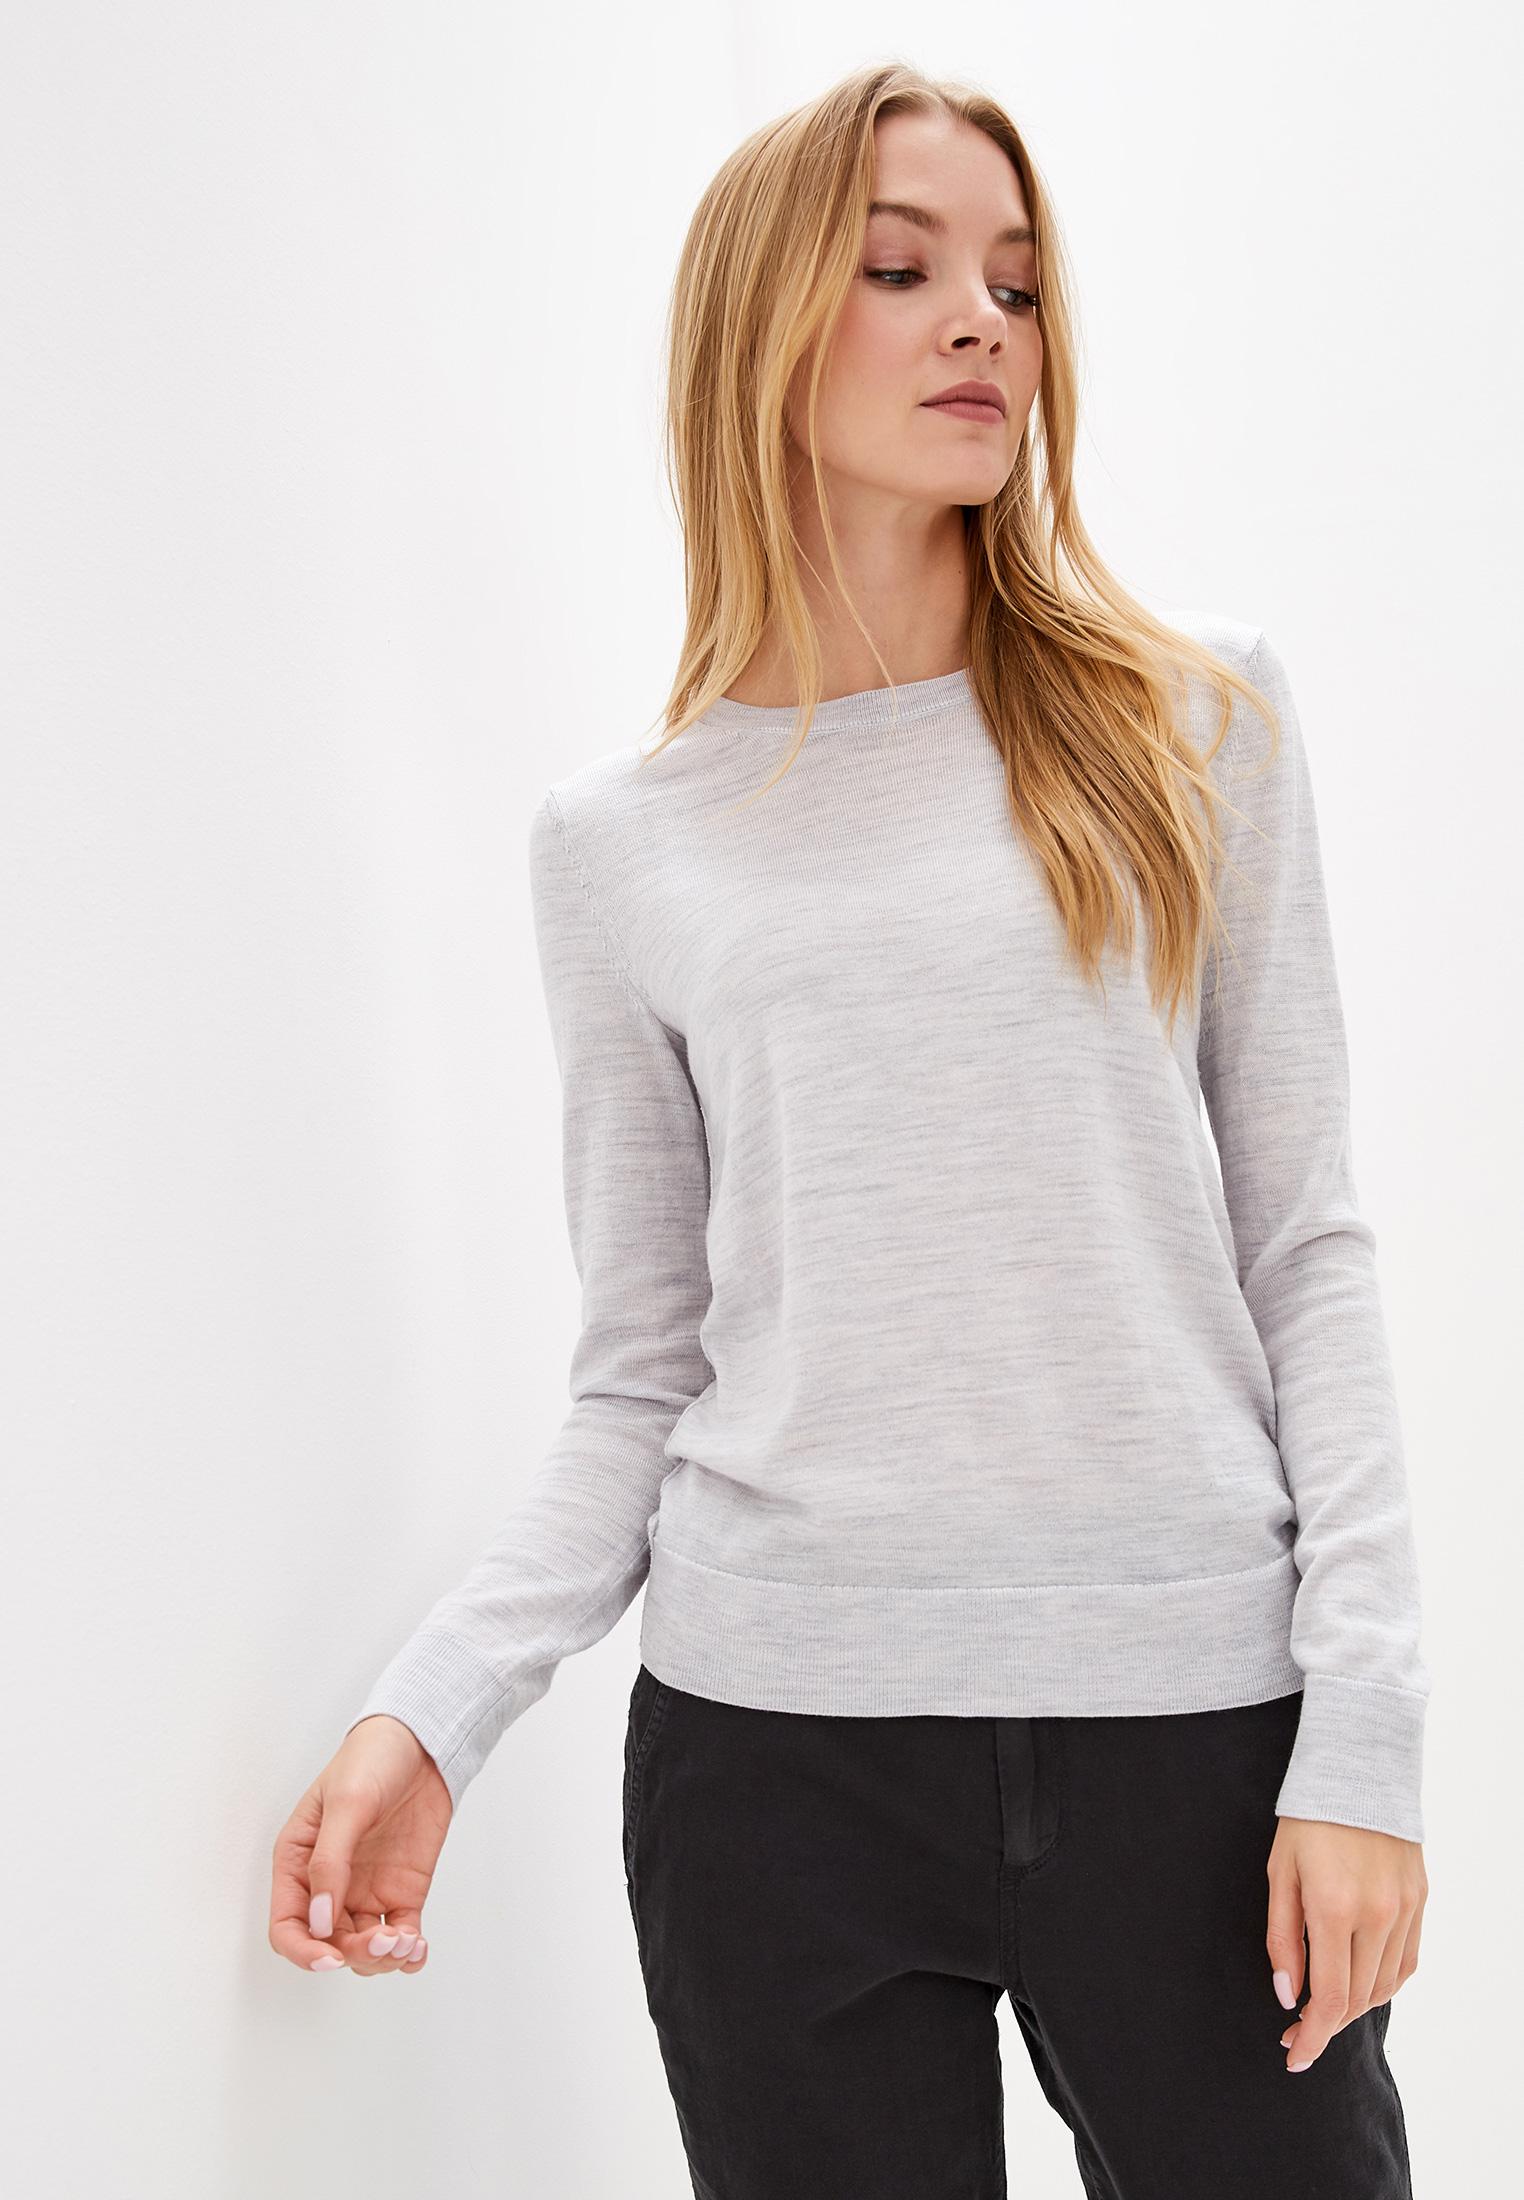 Джемпер, Gap, цвет: серый. Артикул: GA020EWGKTQ9. Одежда / Джемперы, свитеры и кардиганы